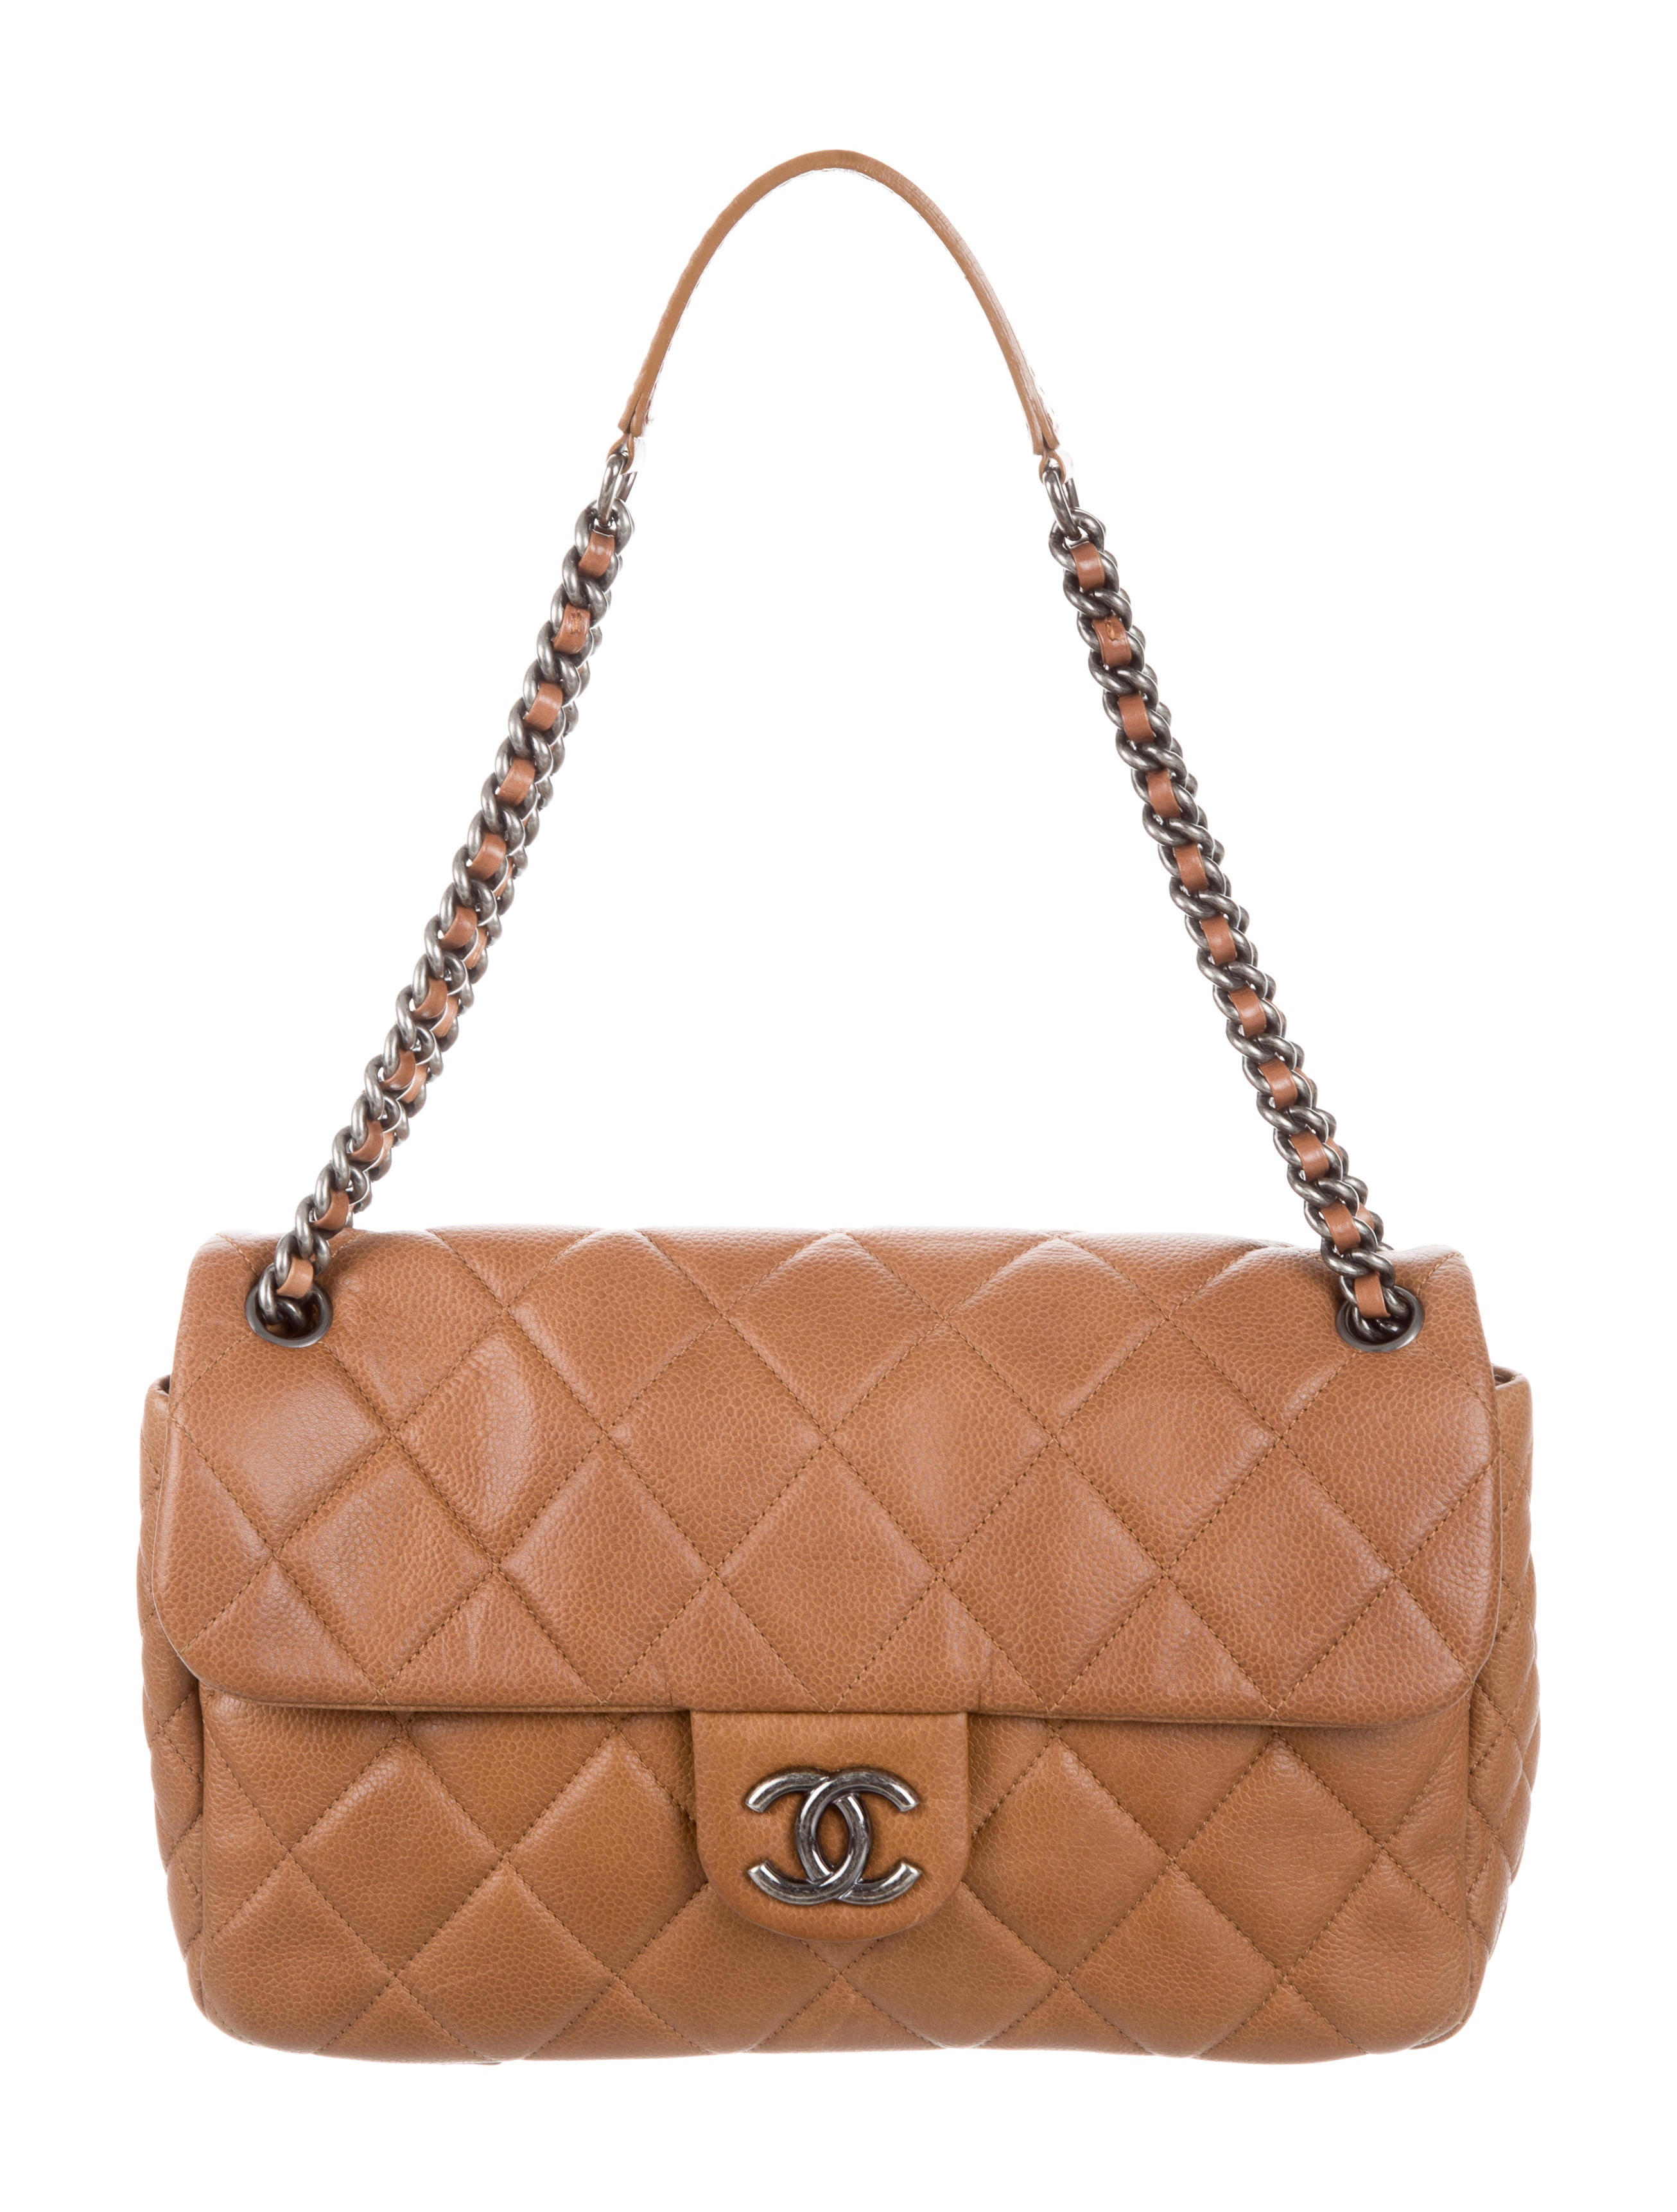 Chanel Coco Casual Flap Bag - Handbags - CHA196407 | The ...